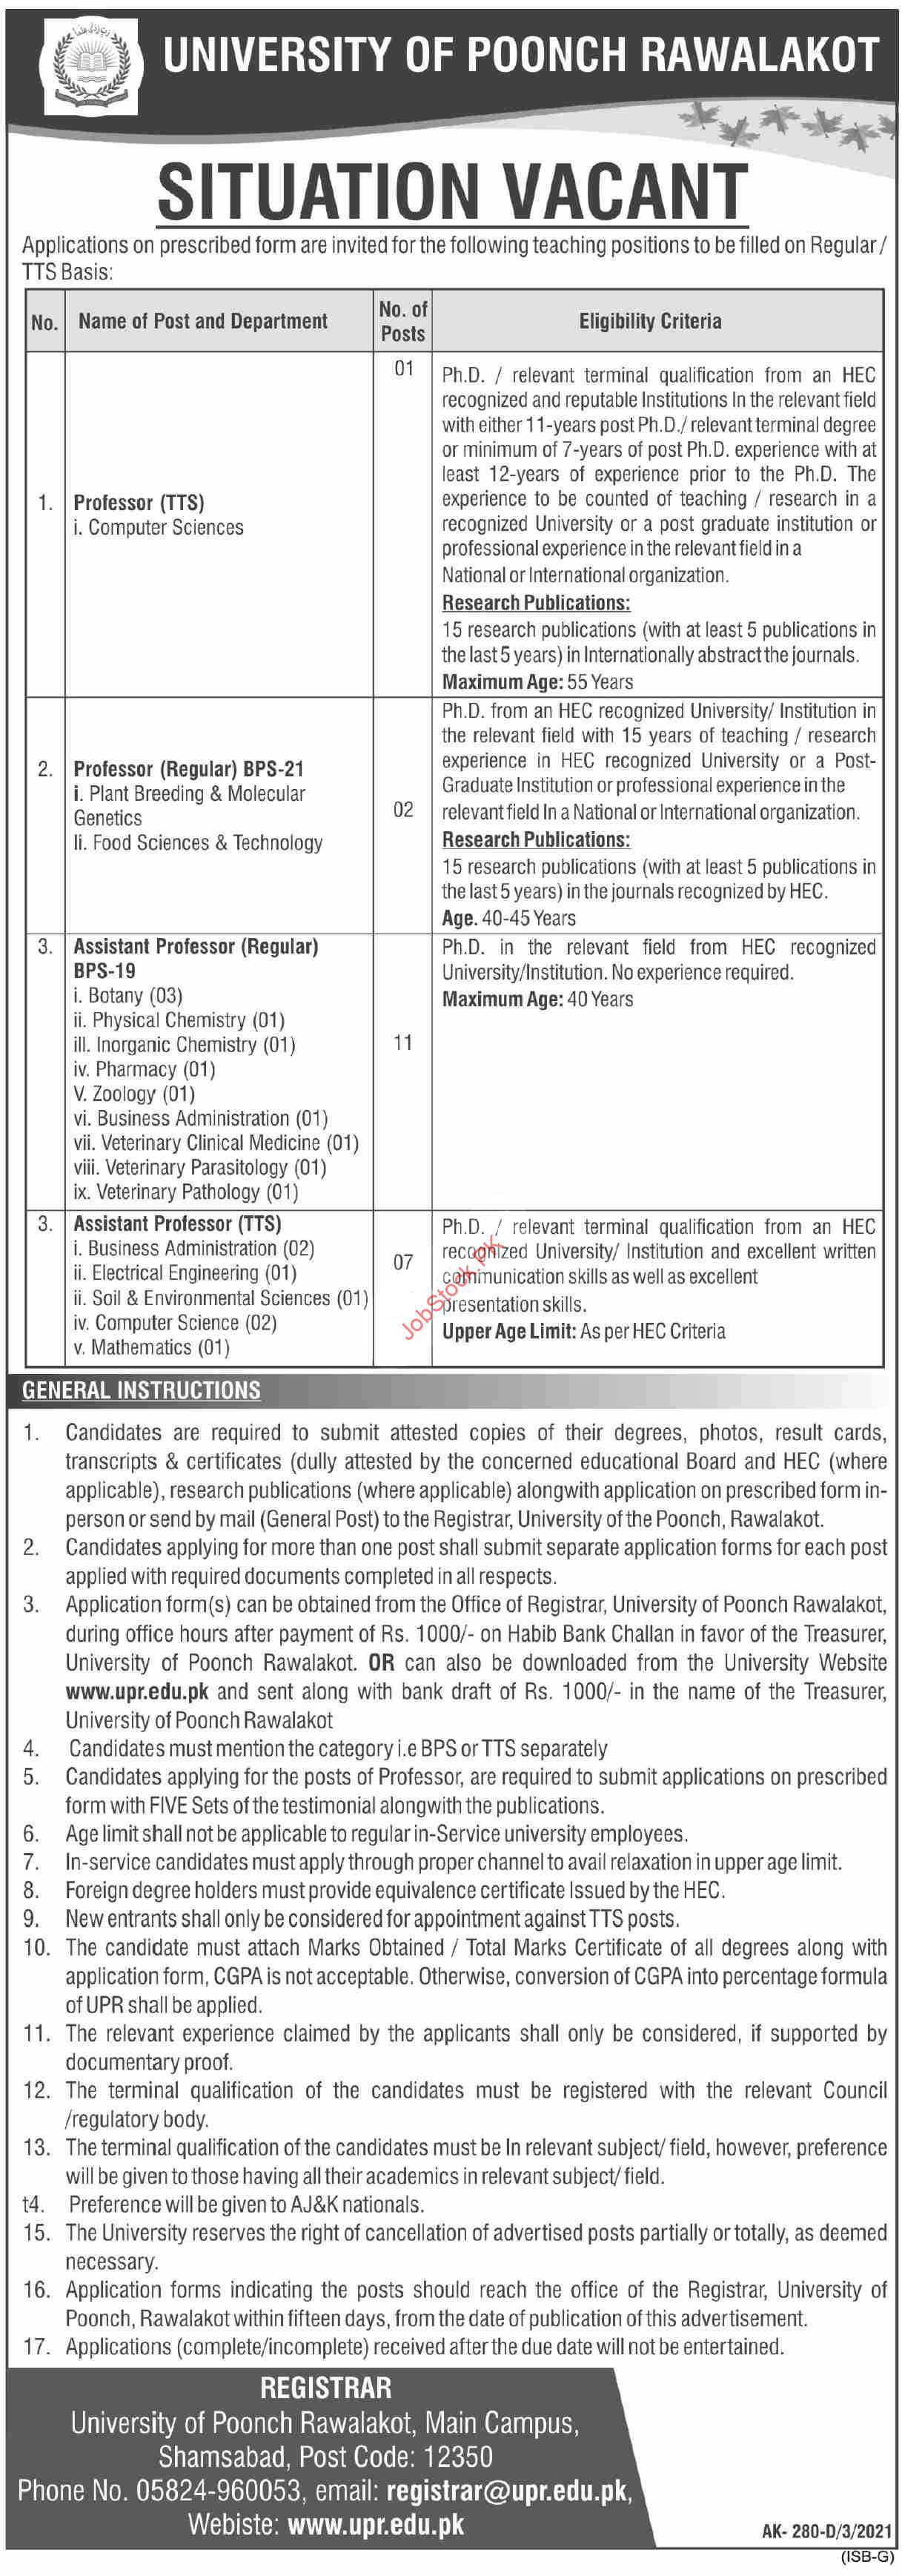 Jobs In University Of Poonch Rawalakot Upr 2021